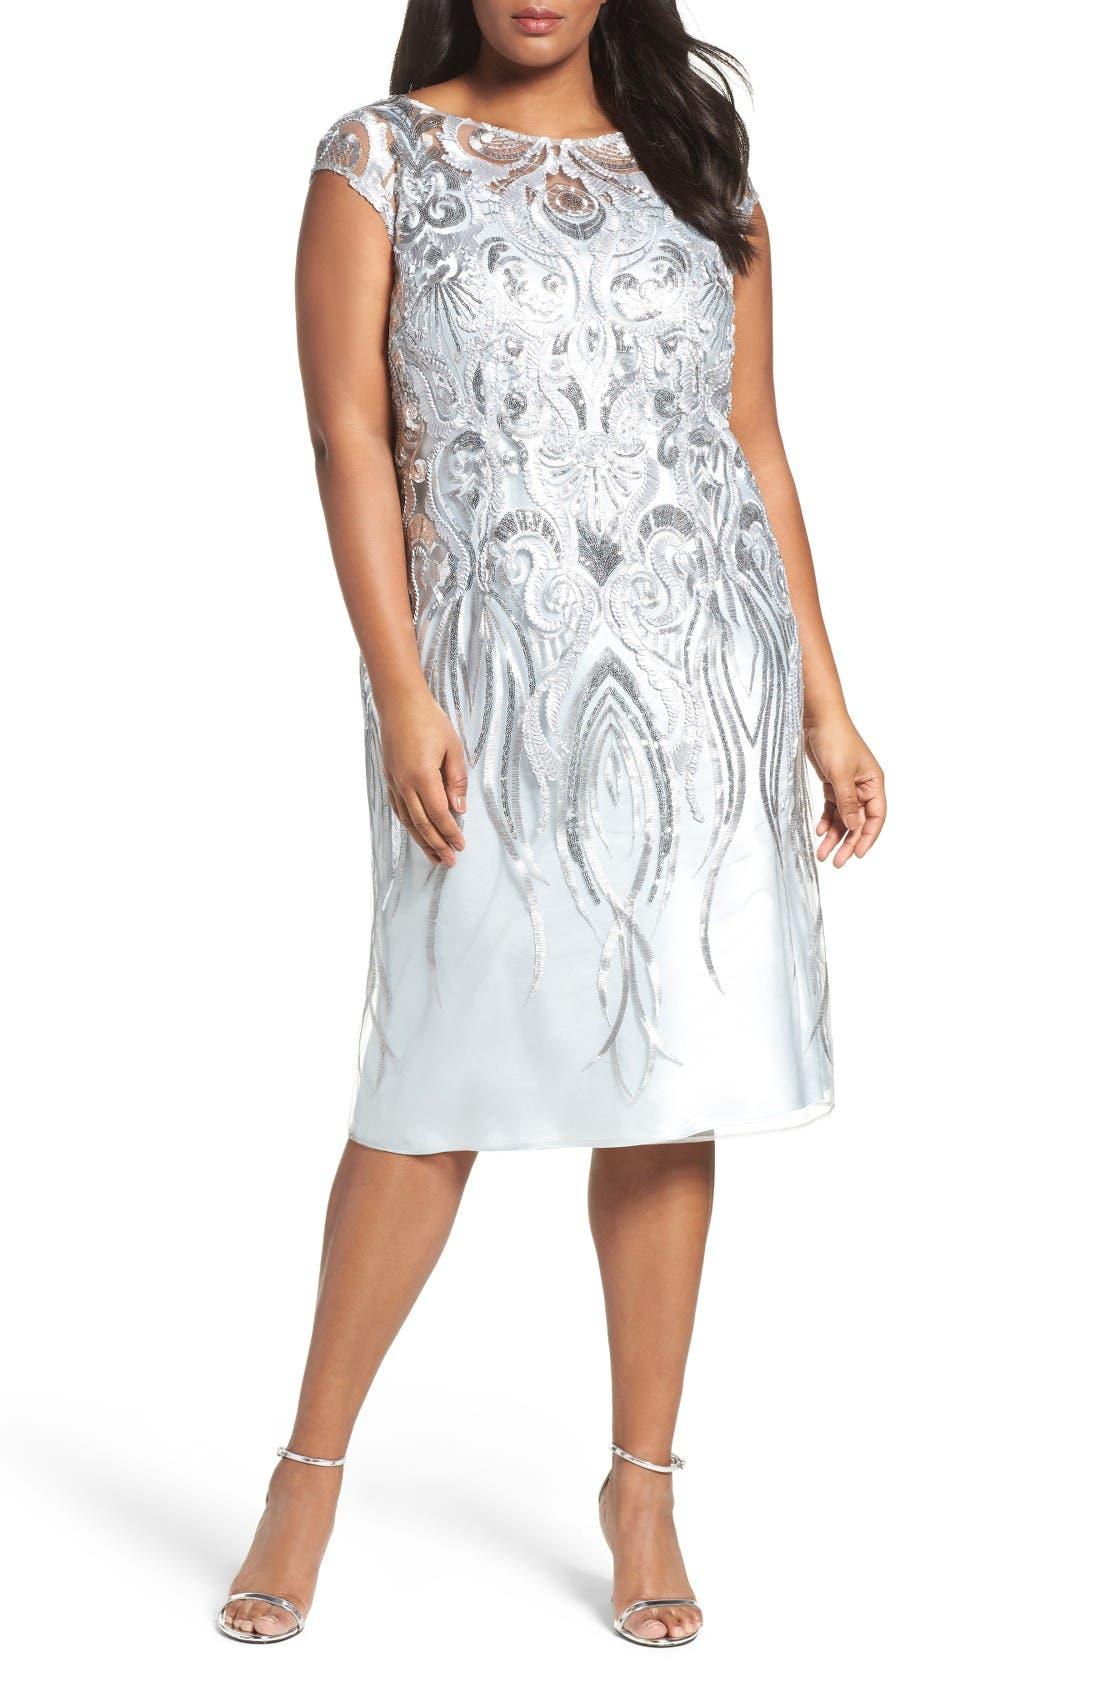 Brianna Embellished Bateau Neck Cocktail Dress (Plus Size)